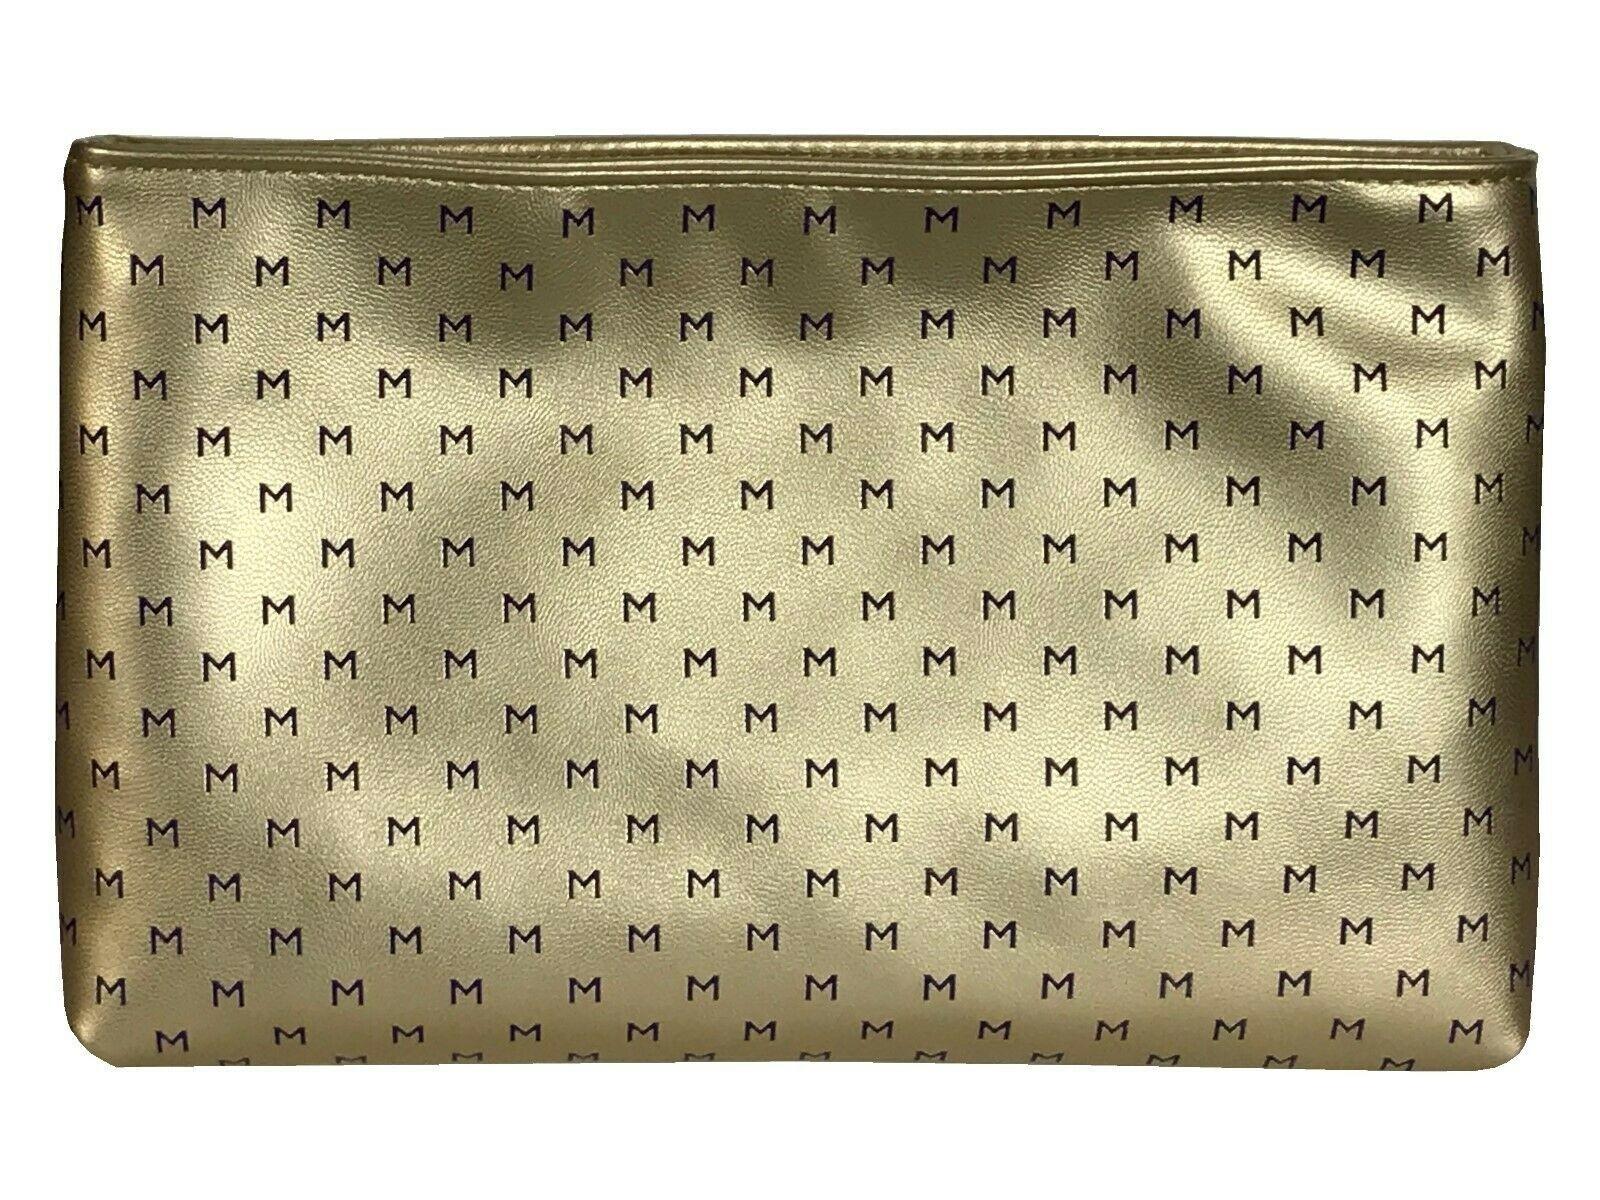 Thierry Mugler Make Up Travel Bag Gold